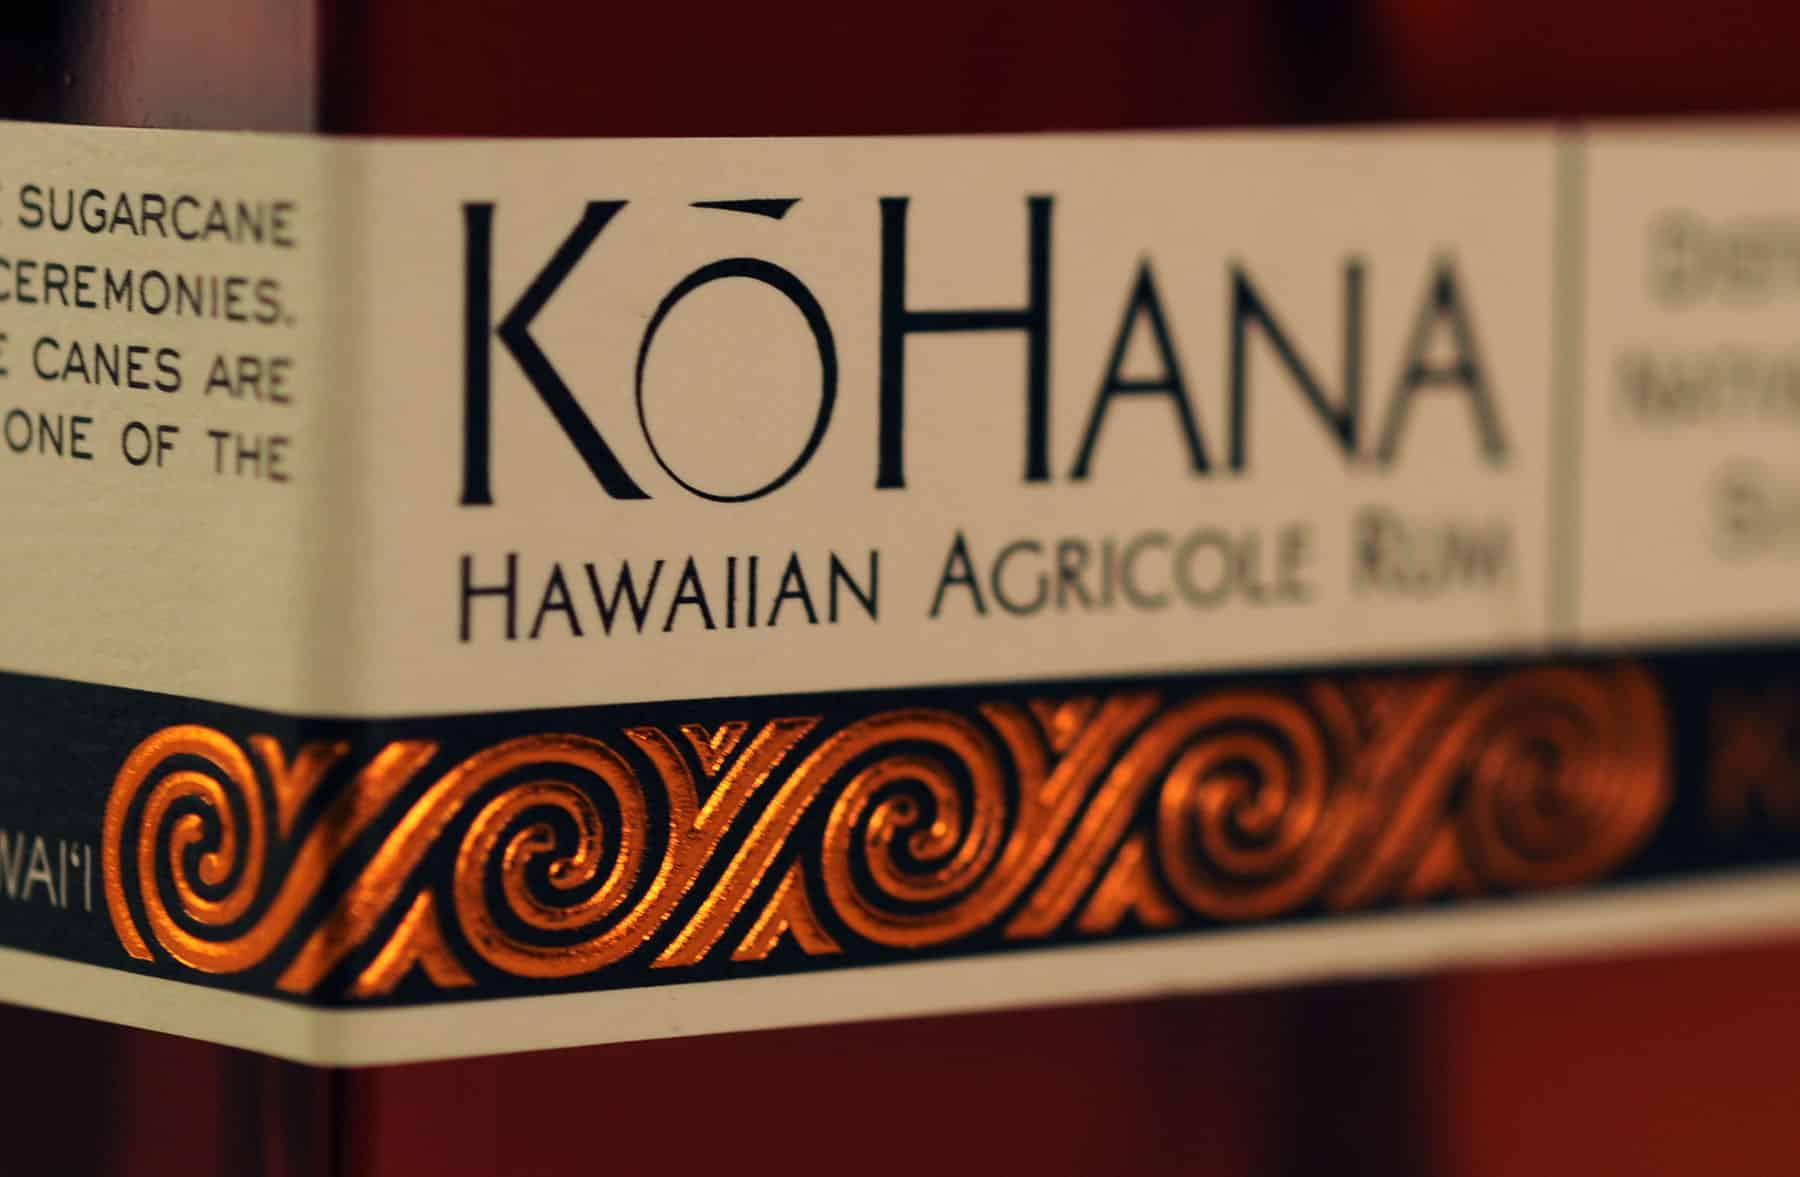 Kō Hana Hawaiian Agricole Rum label close up